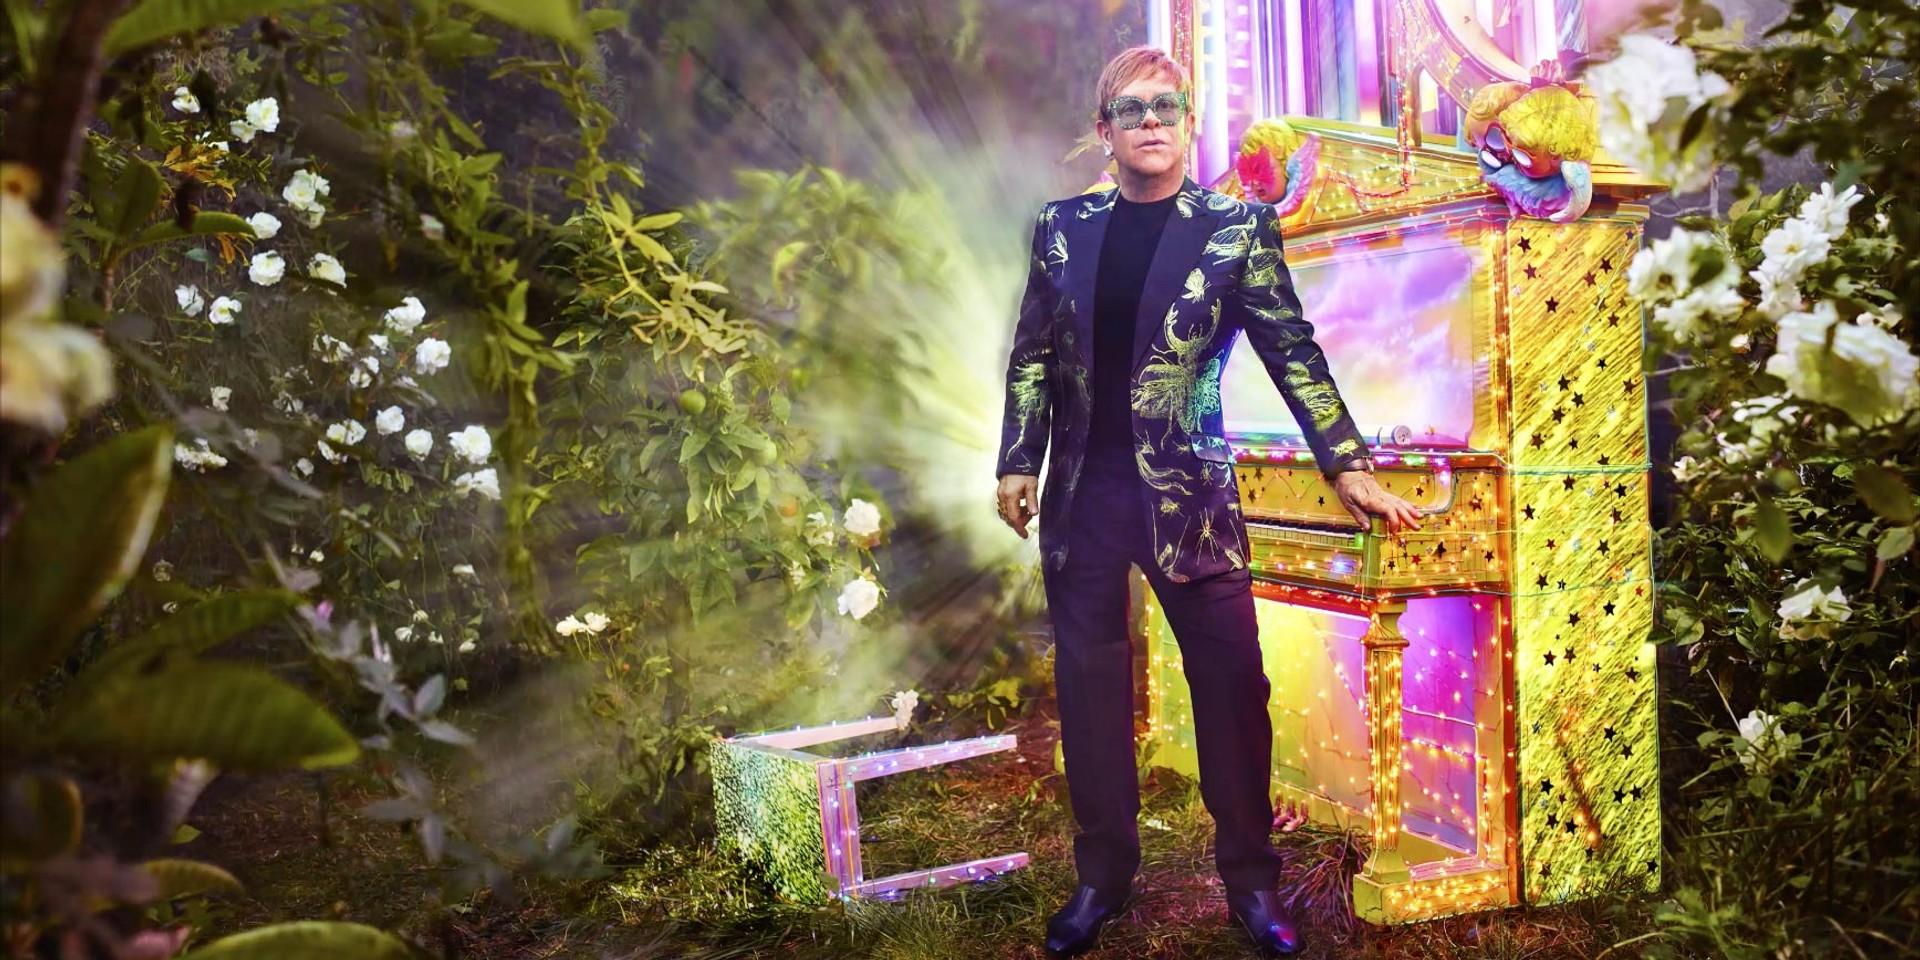 Elton John confirms Asian destinations for farewell tour – Singapore, Hong Kong, Japan, and Korea